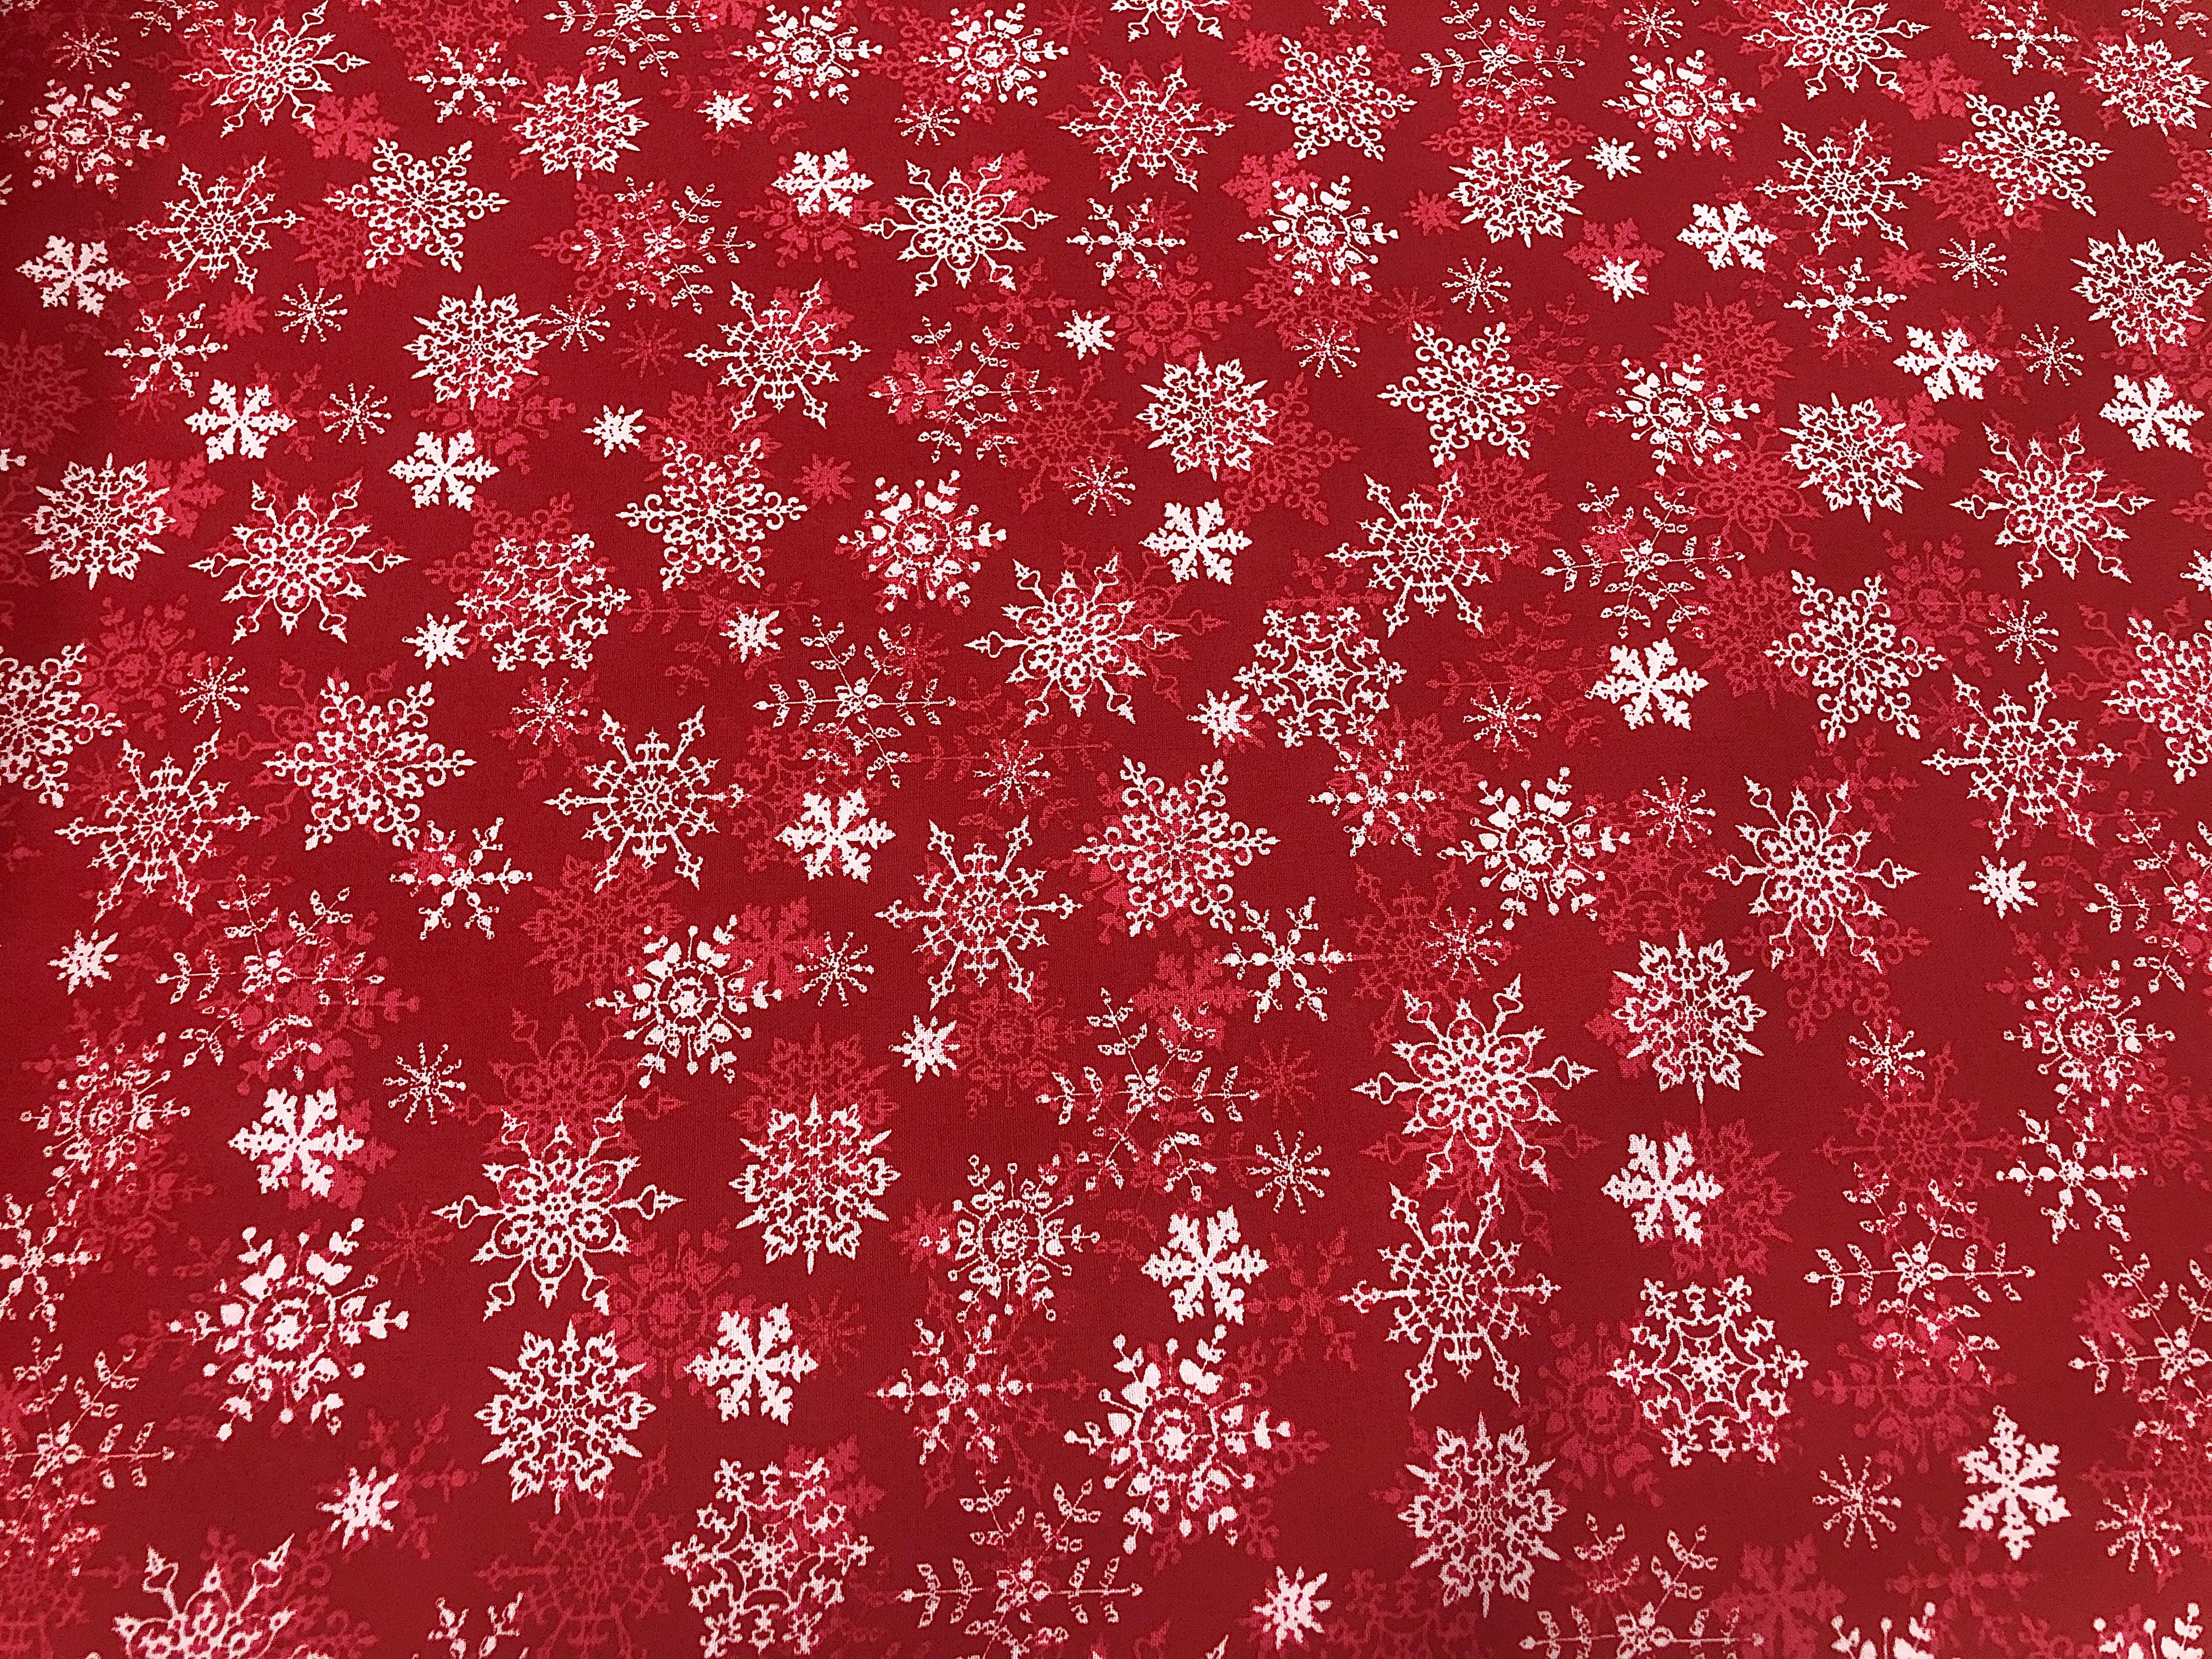 Merry Christmas Basics - Red Snowflakes - 1/2m cut 56382